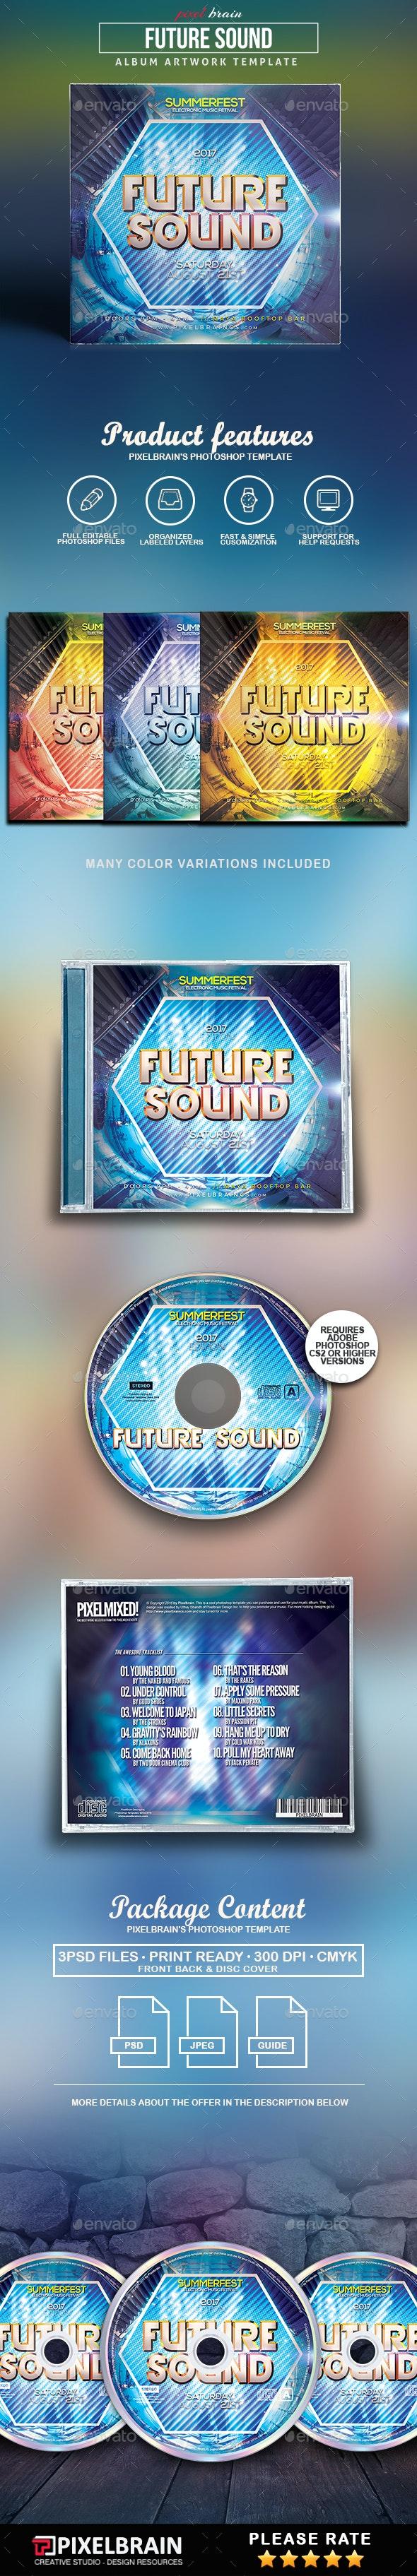 Future Sounds CD Cover Artwork - CD & DVD Artwork Print Templates